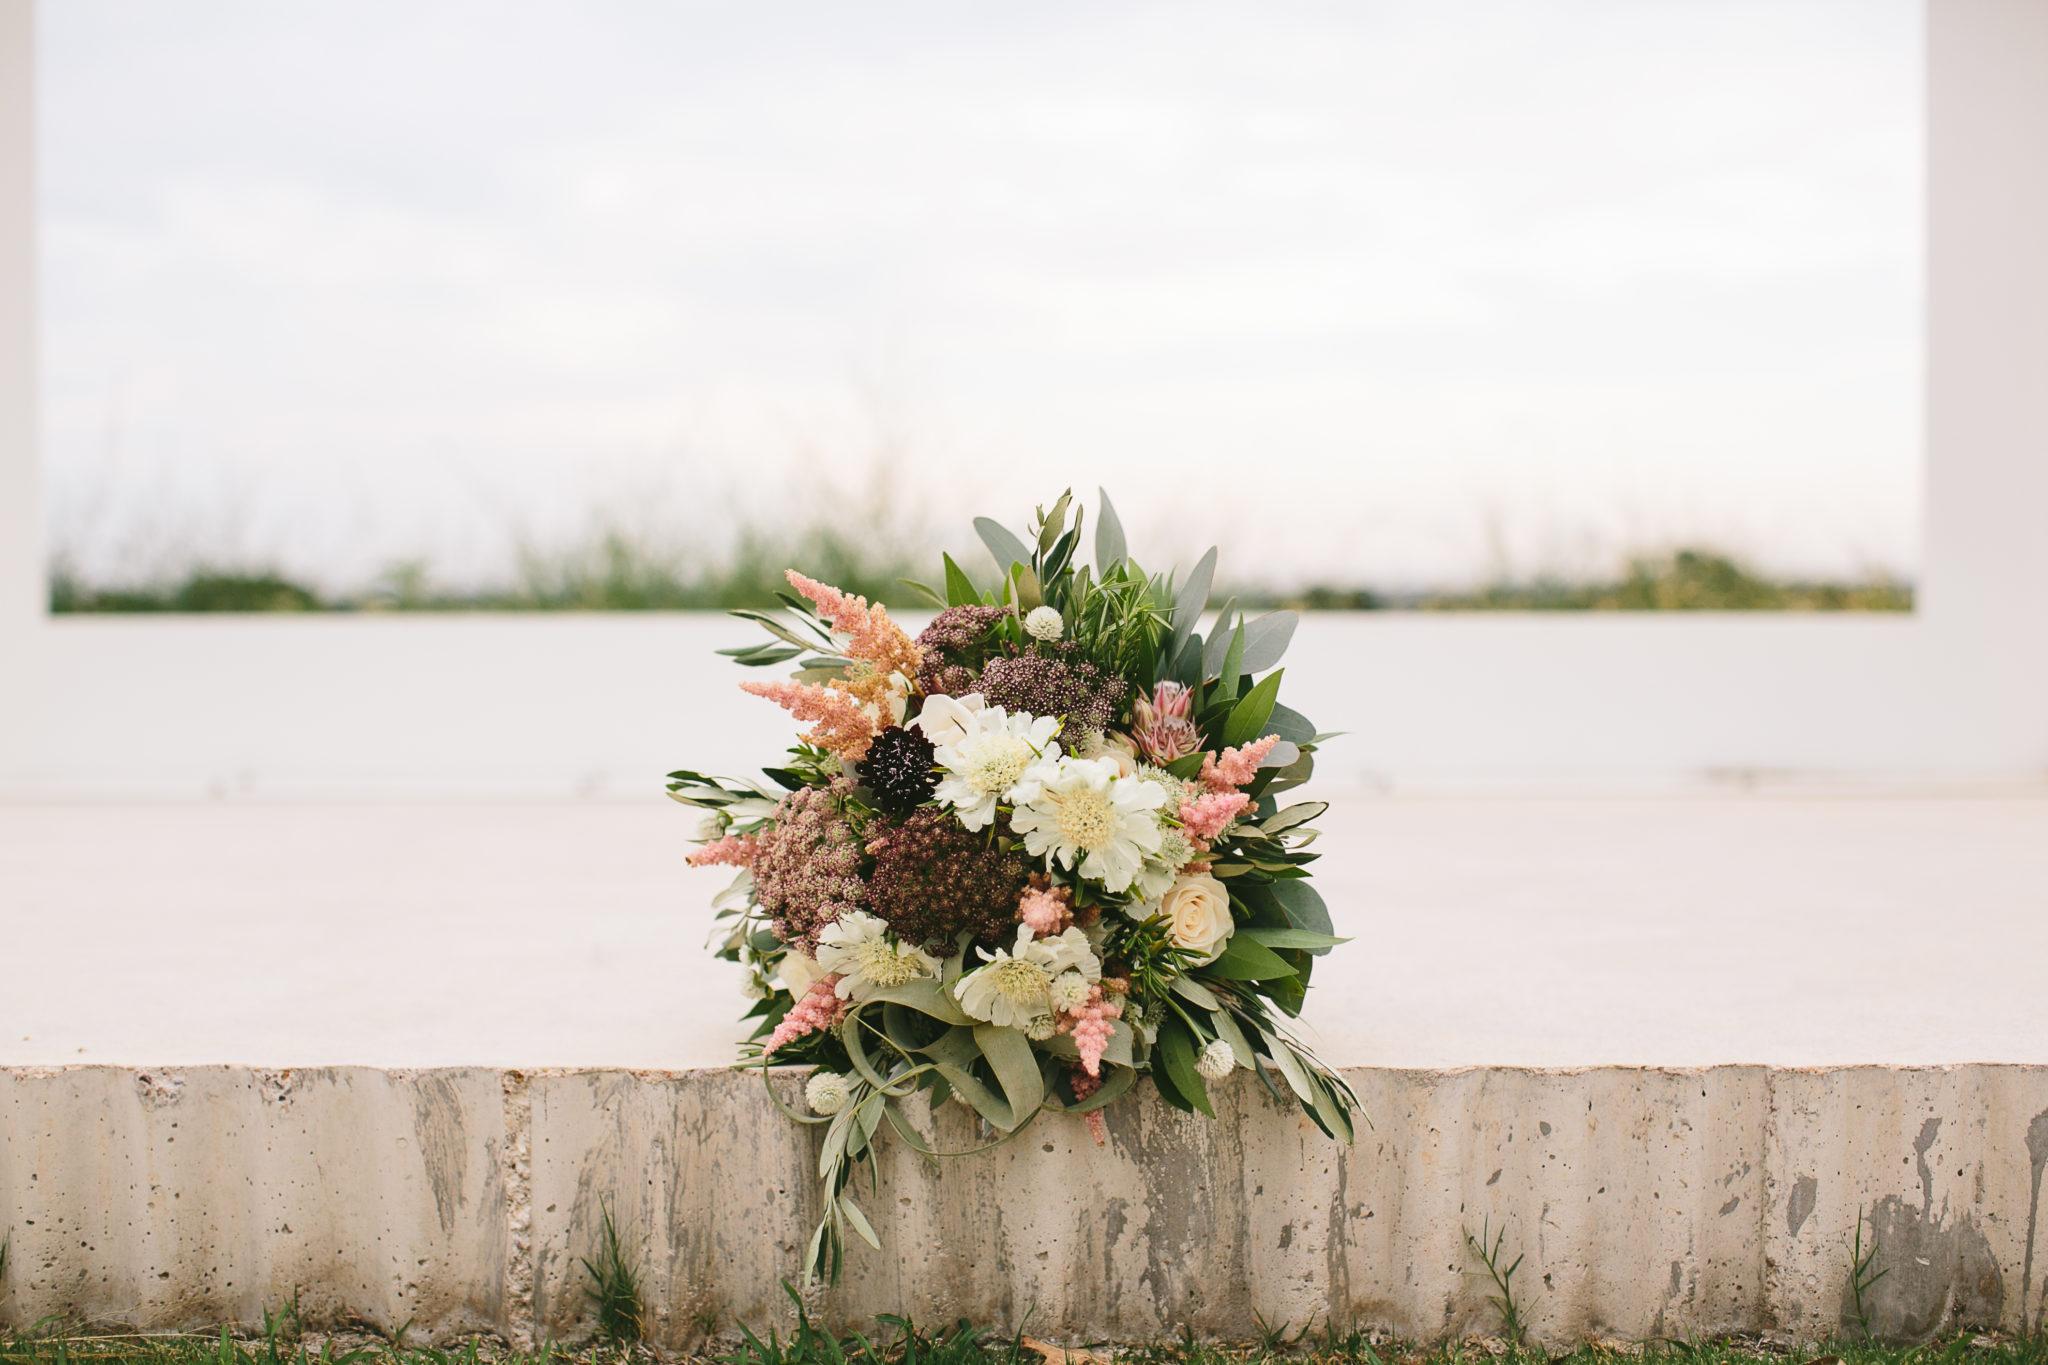 king-florist-bouquet-custom